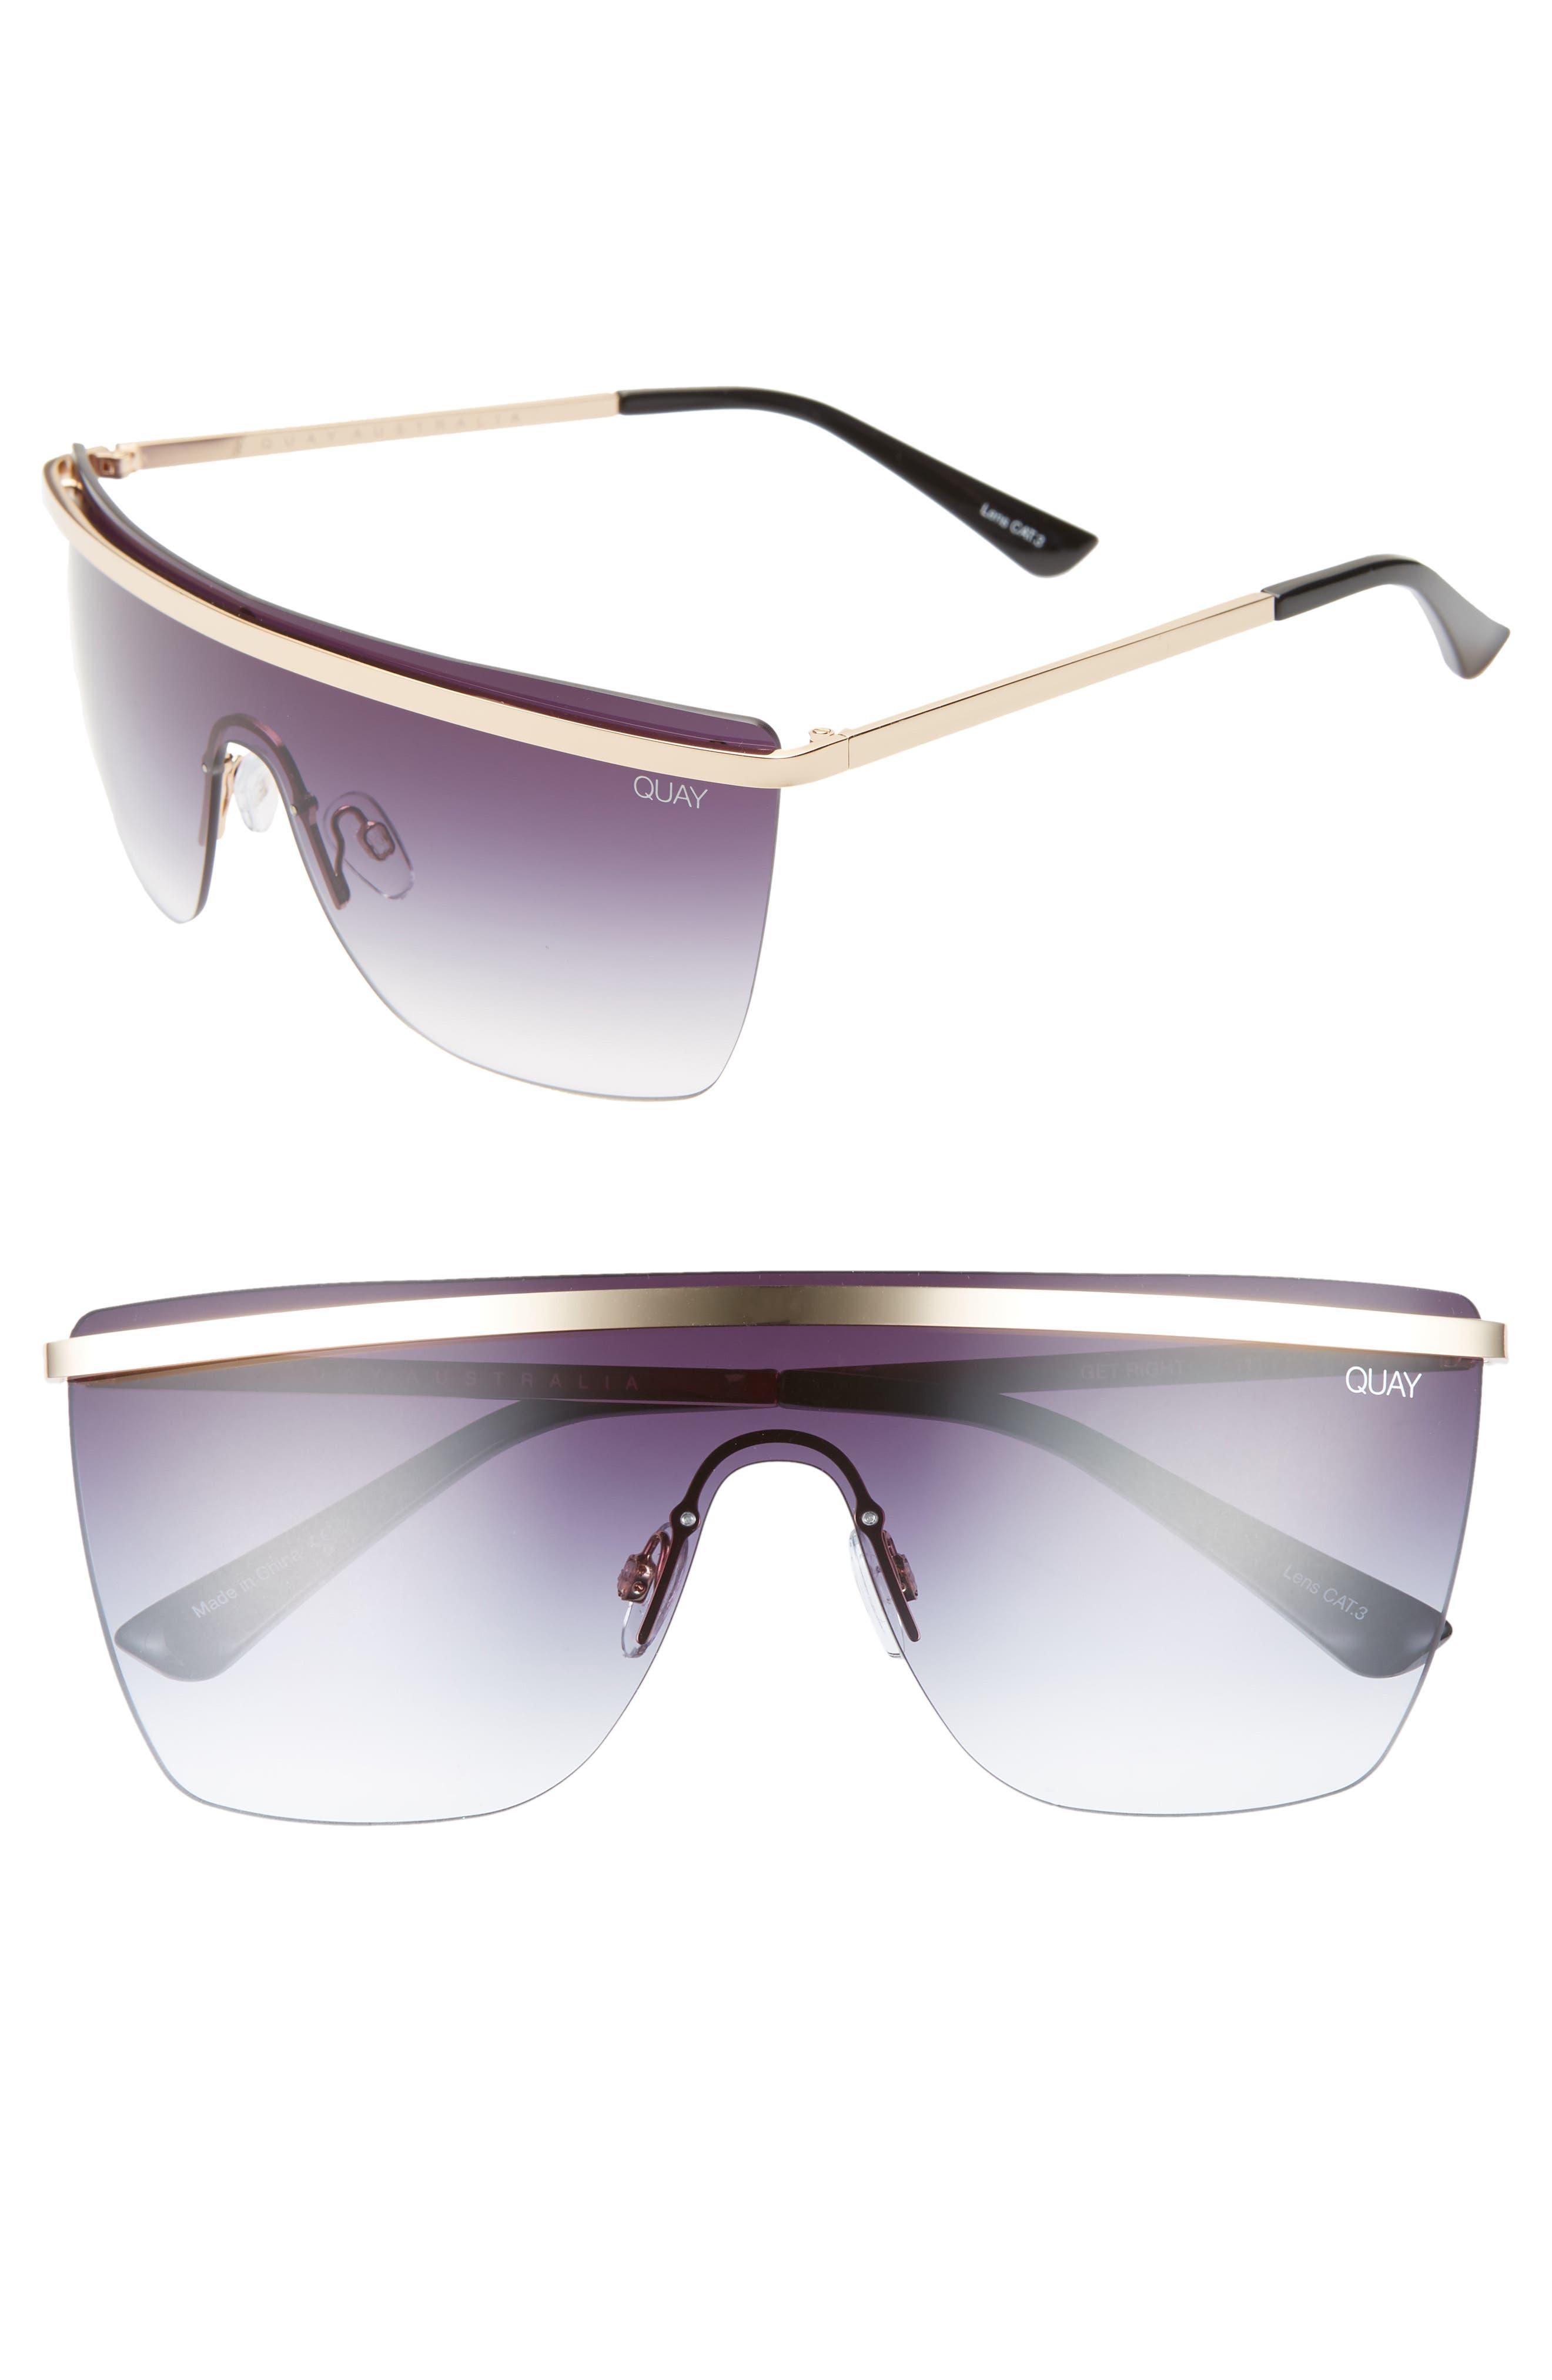 Quay Shield Sunglasses